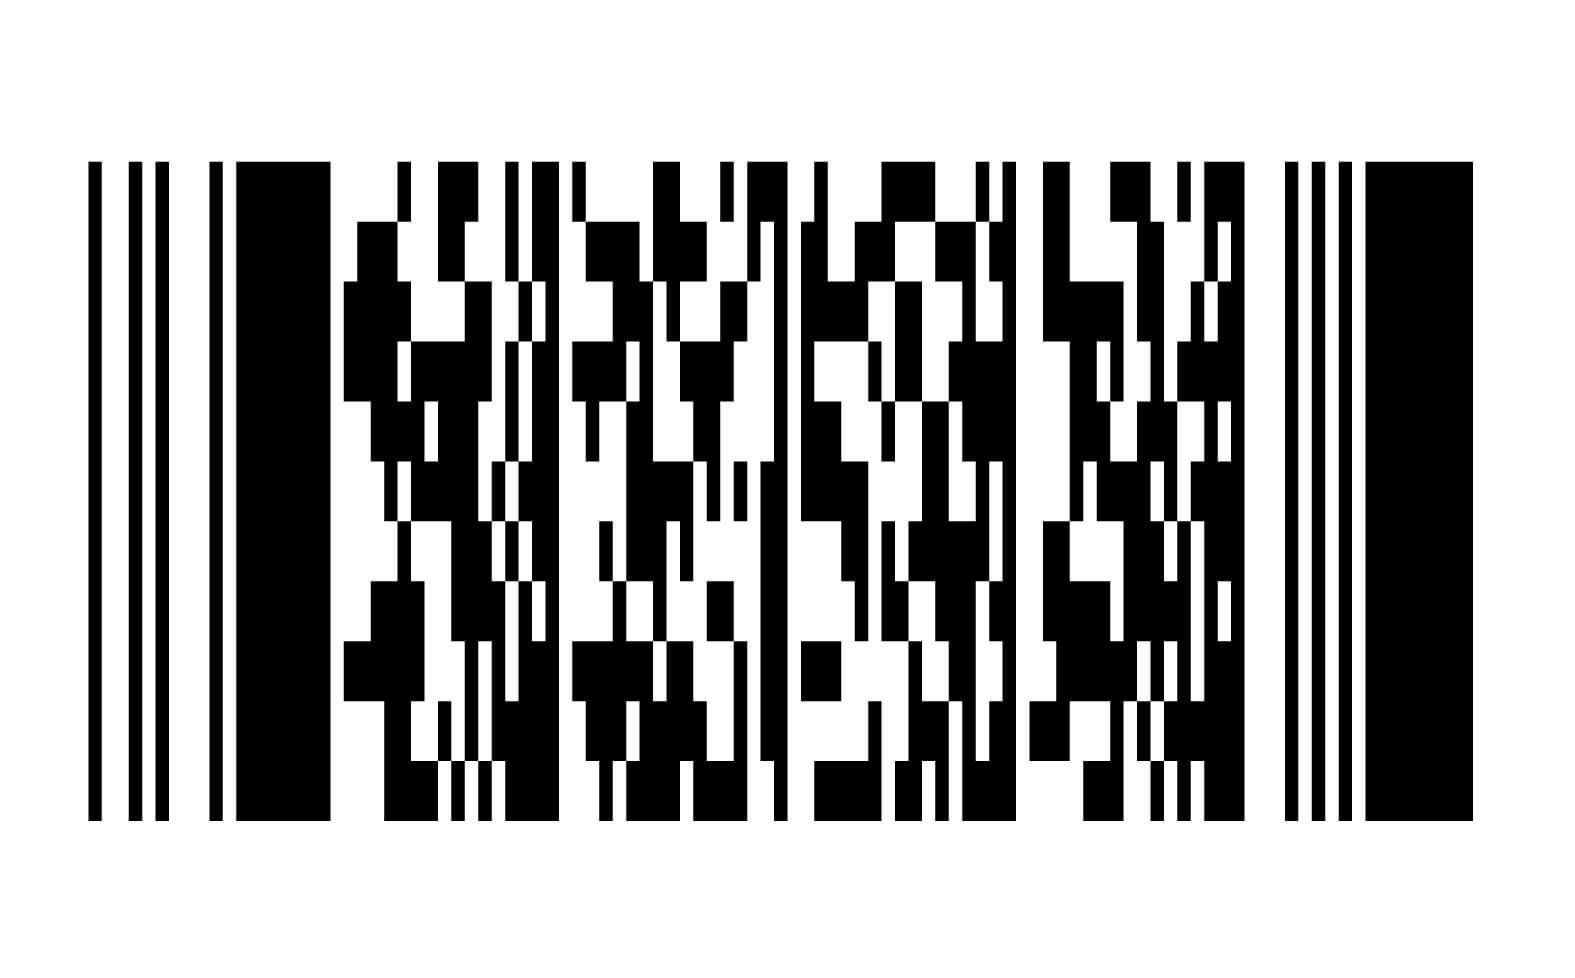 карта карусель штрих код фото